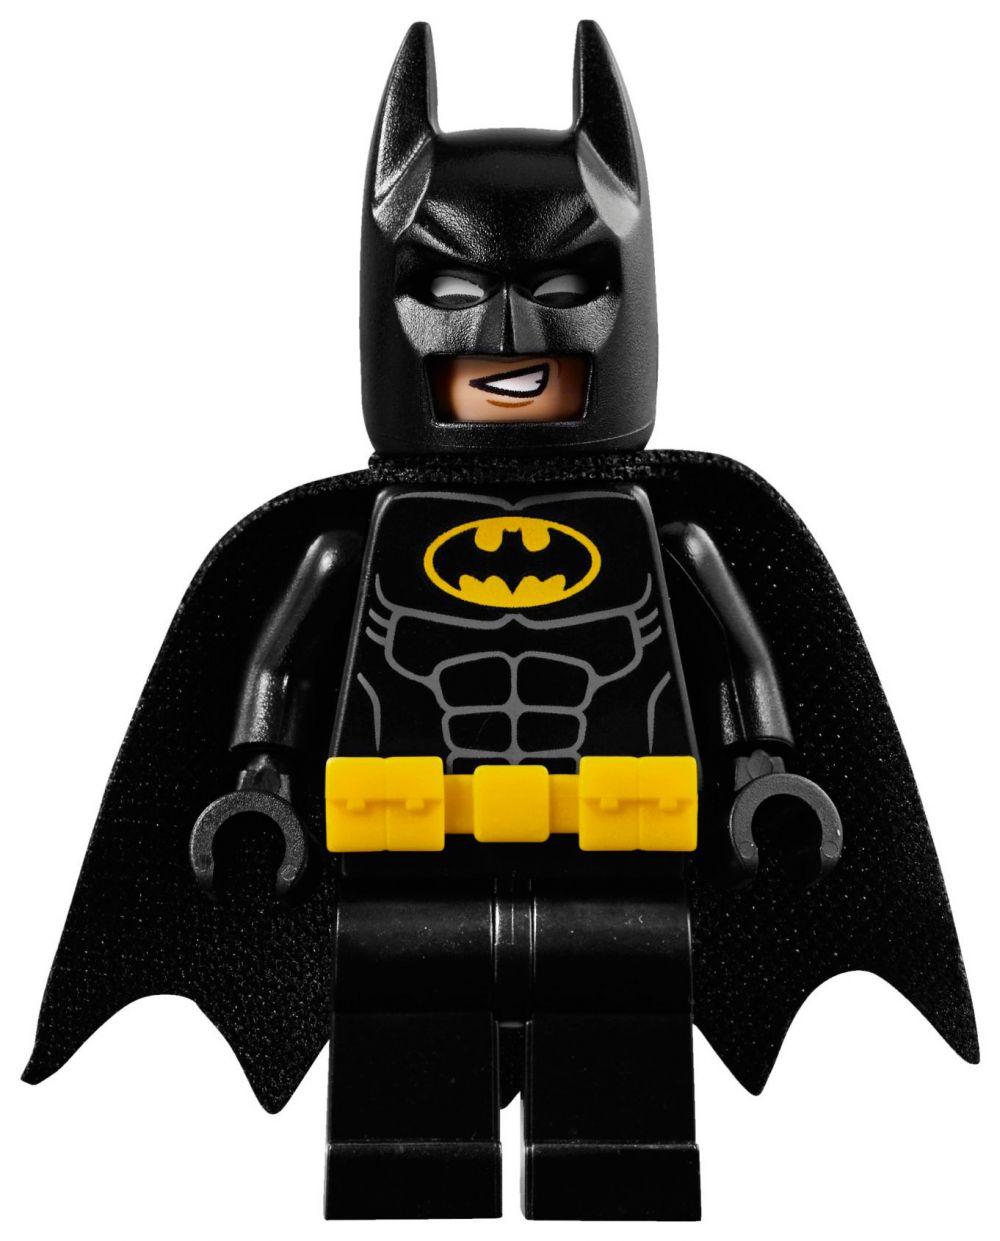 Lego The Batman Movie 853650 Pas Cher Ensemble Movie